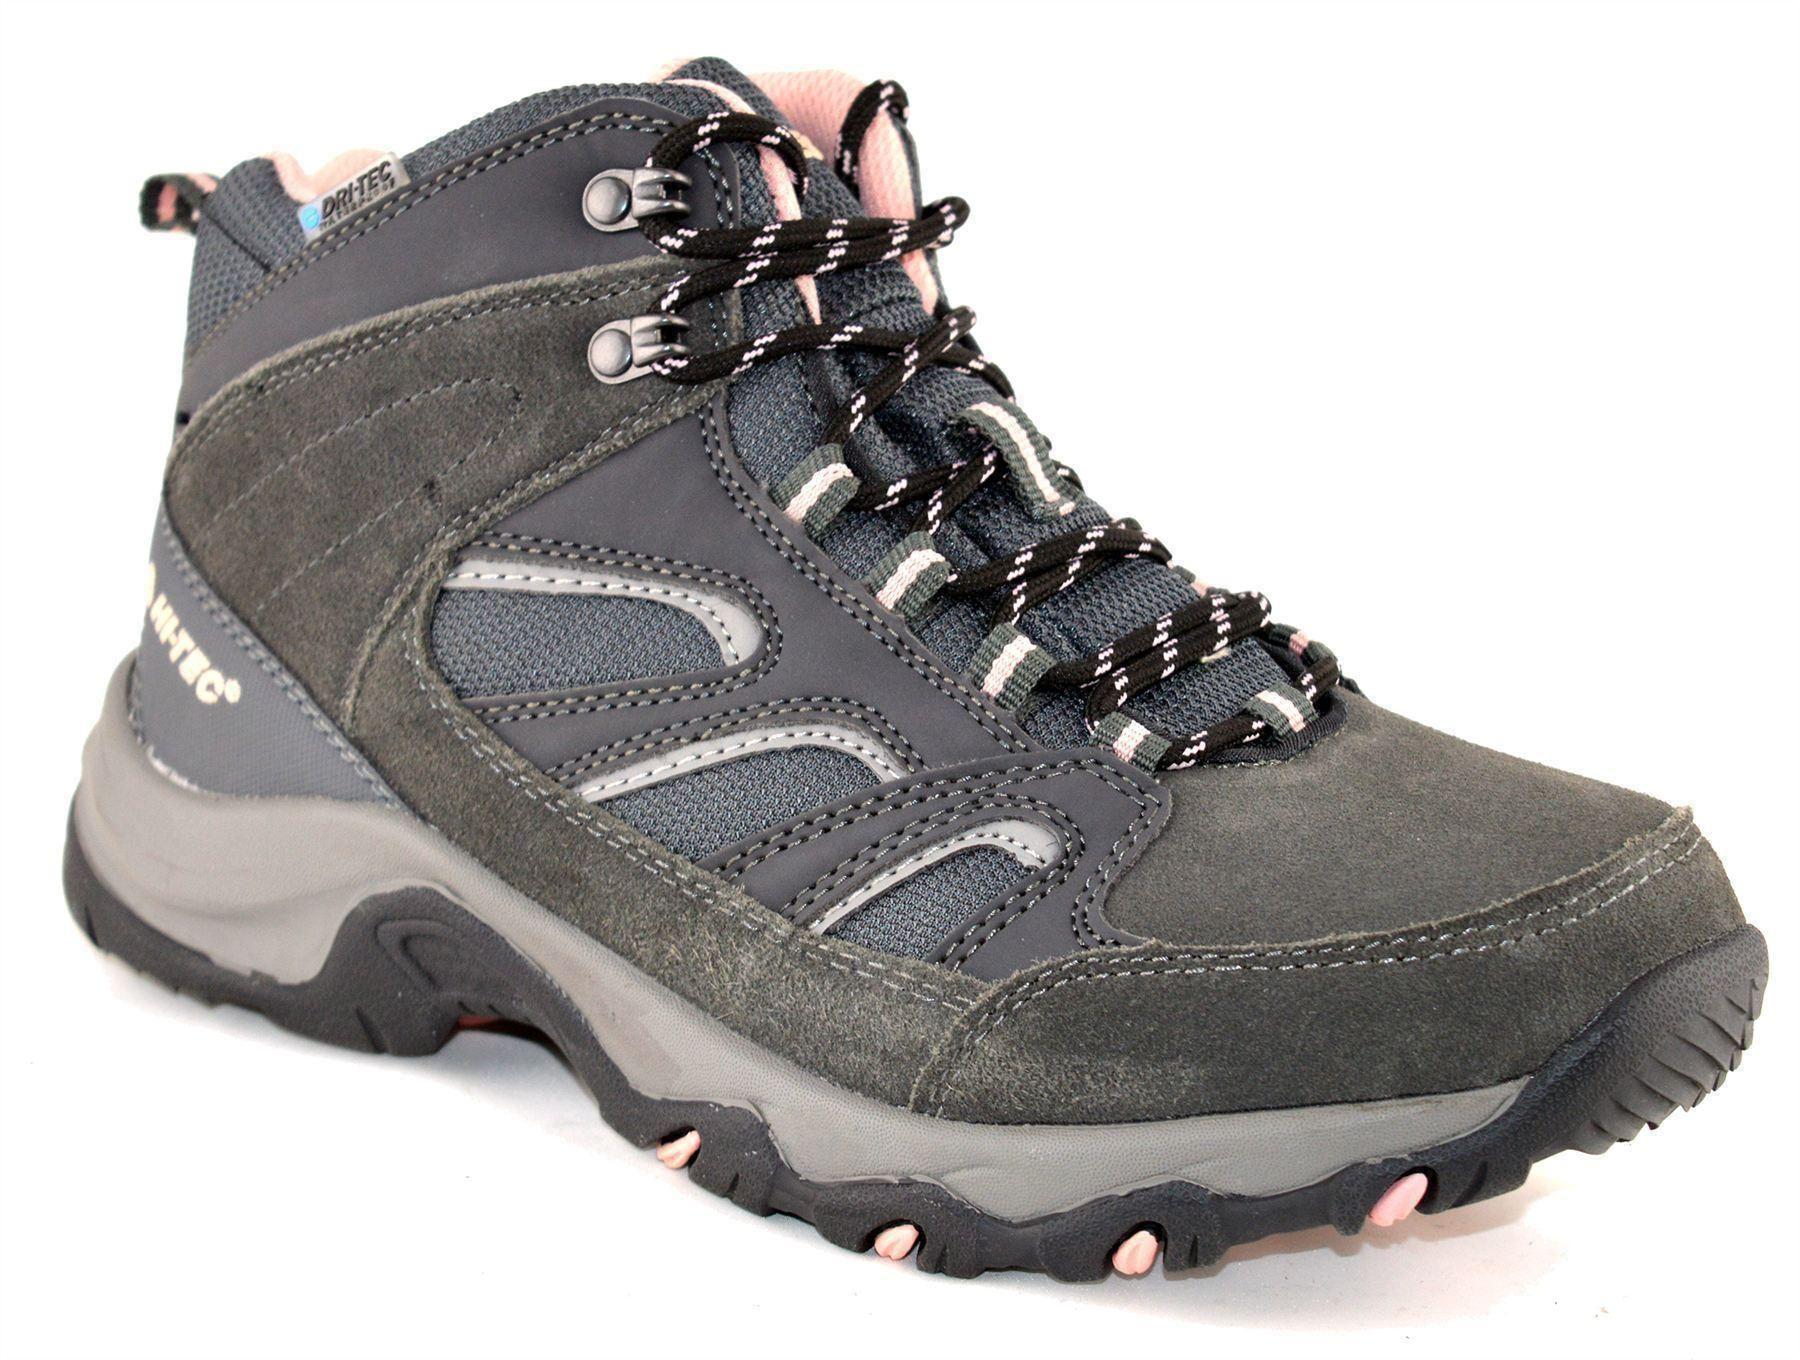 Awesome Womens NorthWest WaterProof Leather Lace Up Walking Hiking Boots UK Sizes 3 To 8 | EBay